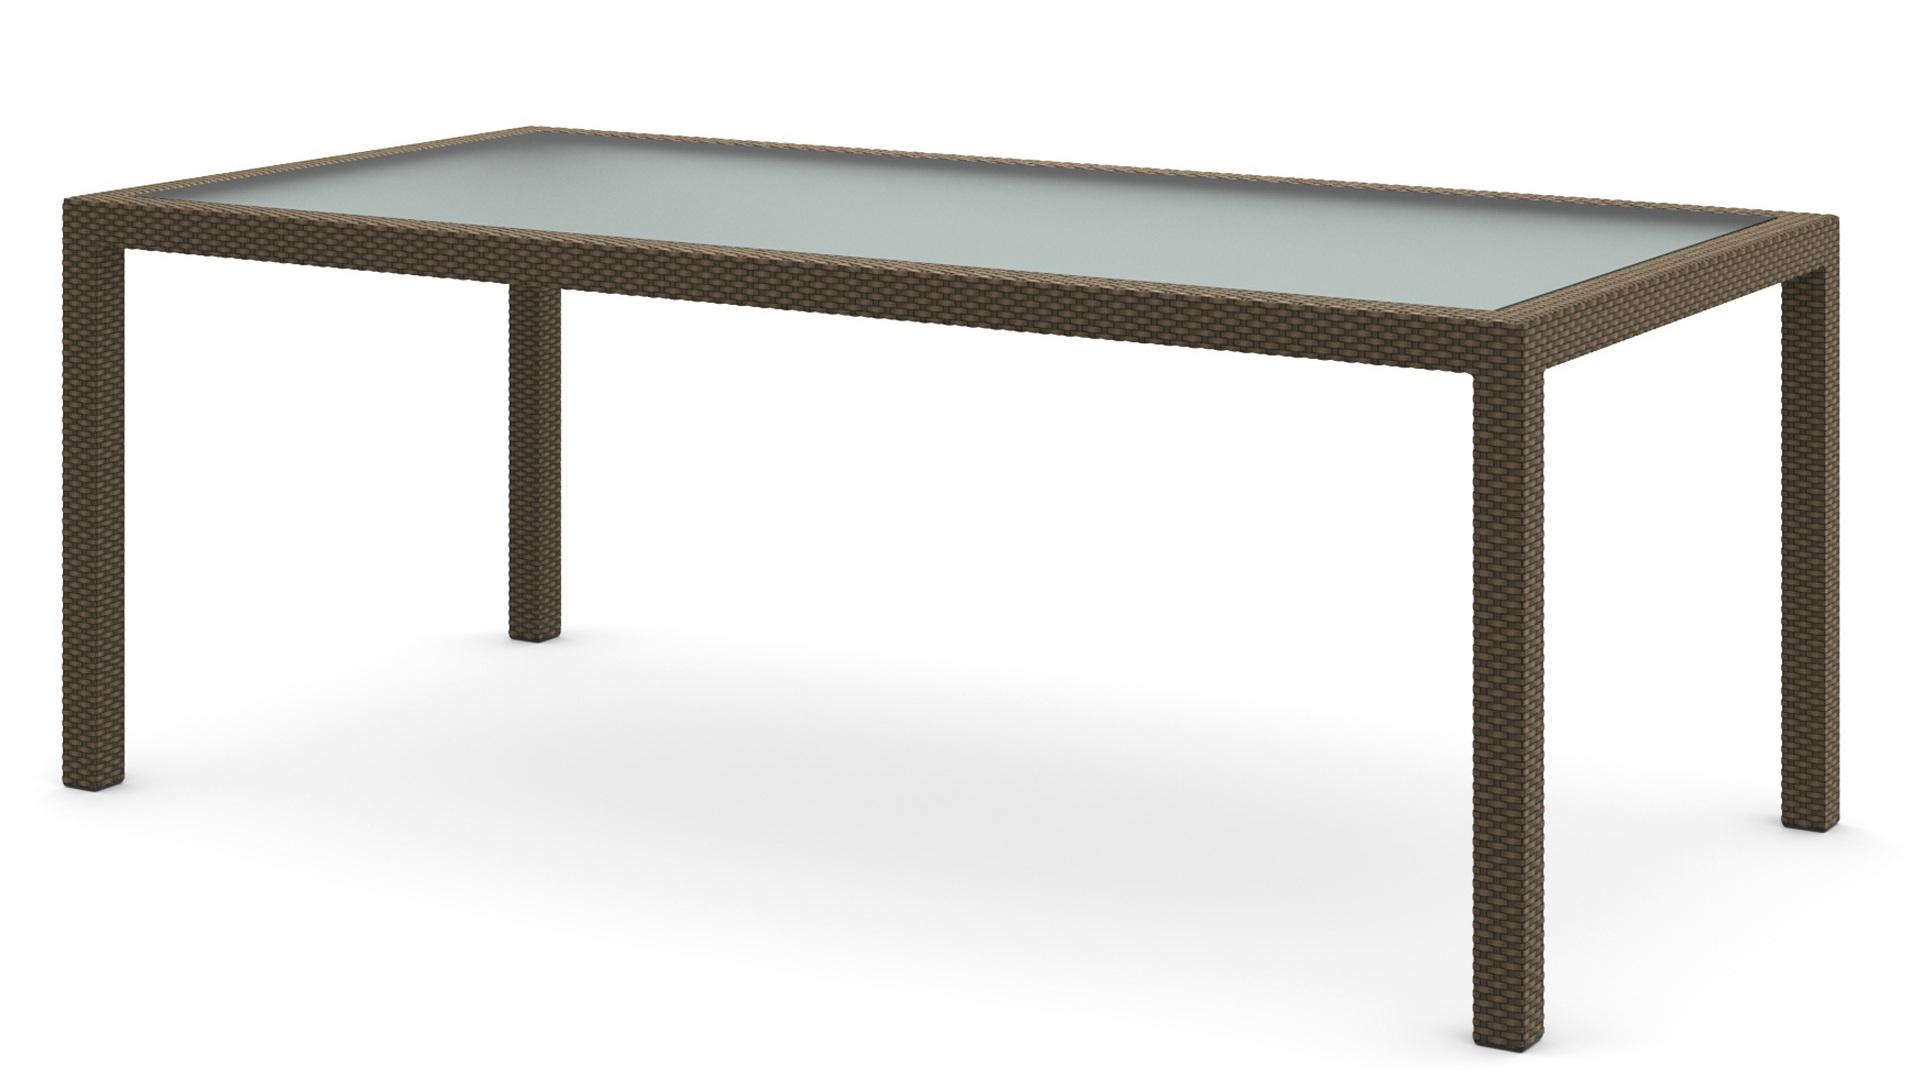 Panama dining table rectangular.jpg